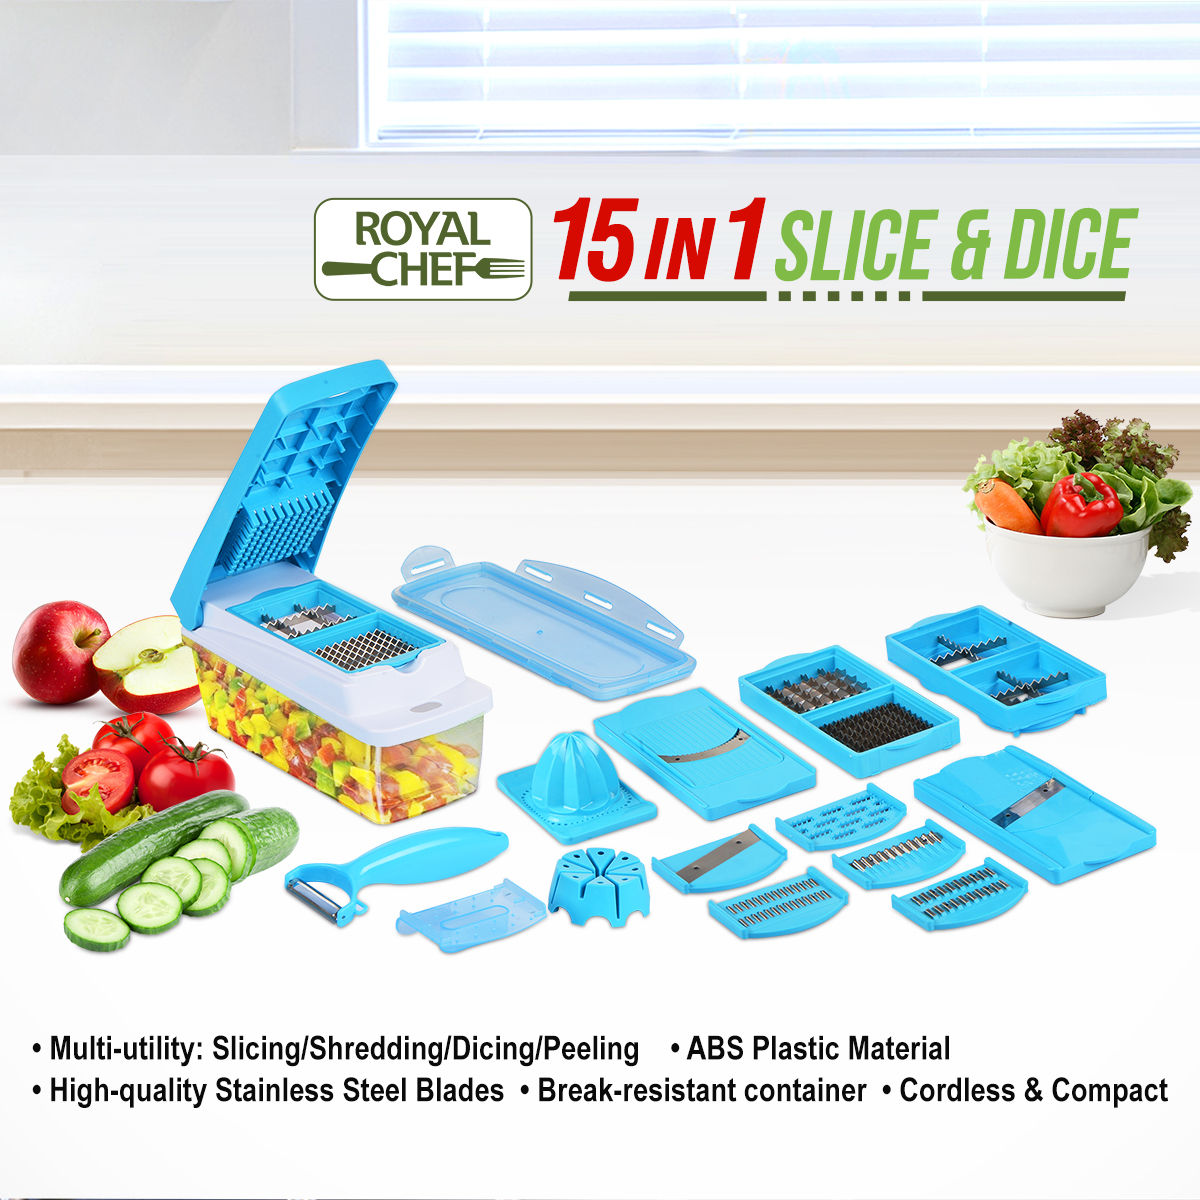 Royal Chef Home Kitchen Appliances - Buy Royal Chef Home Kitchen ...